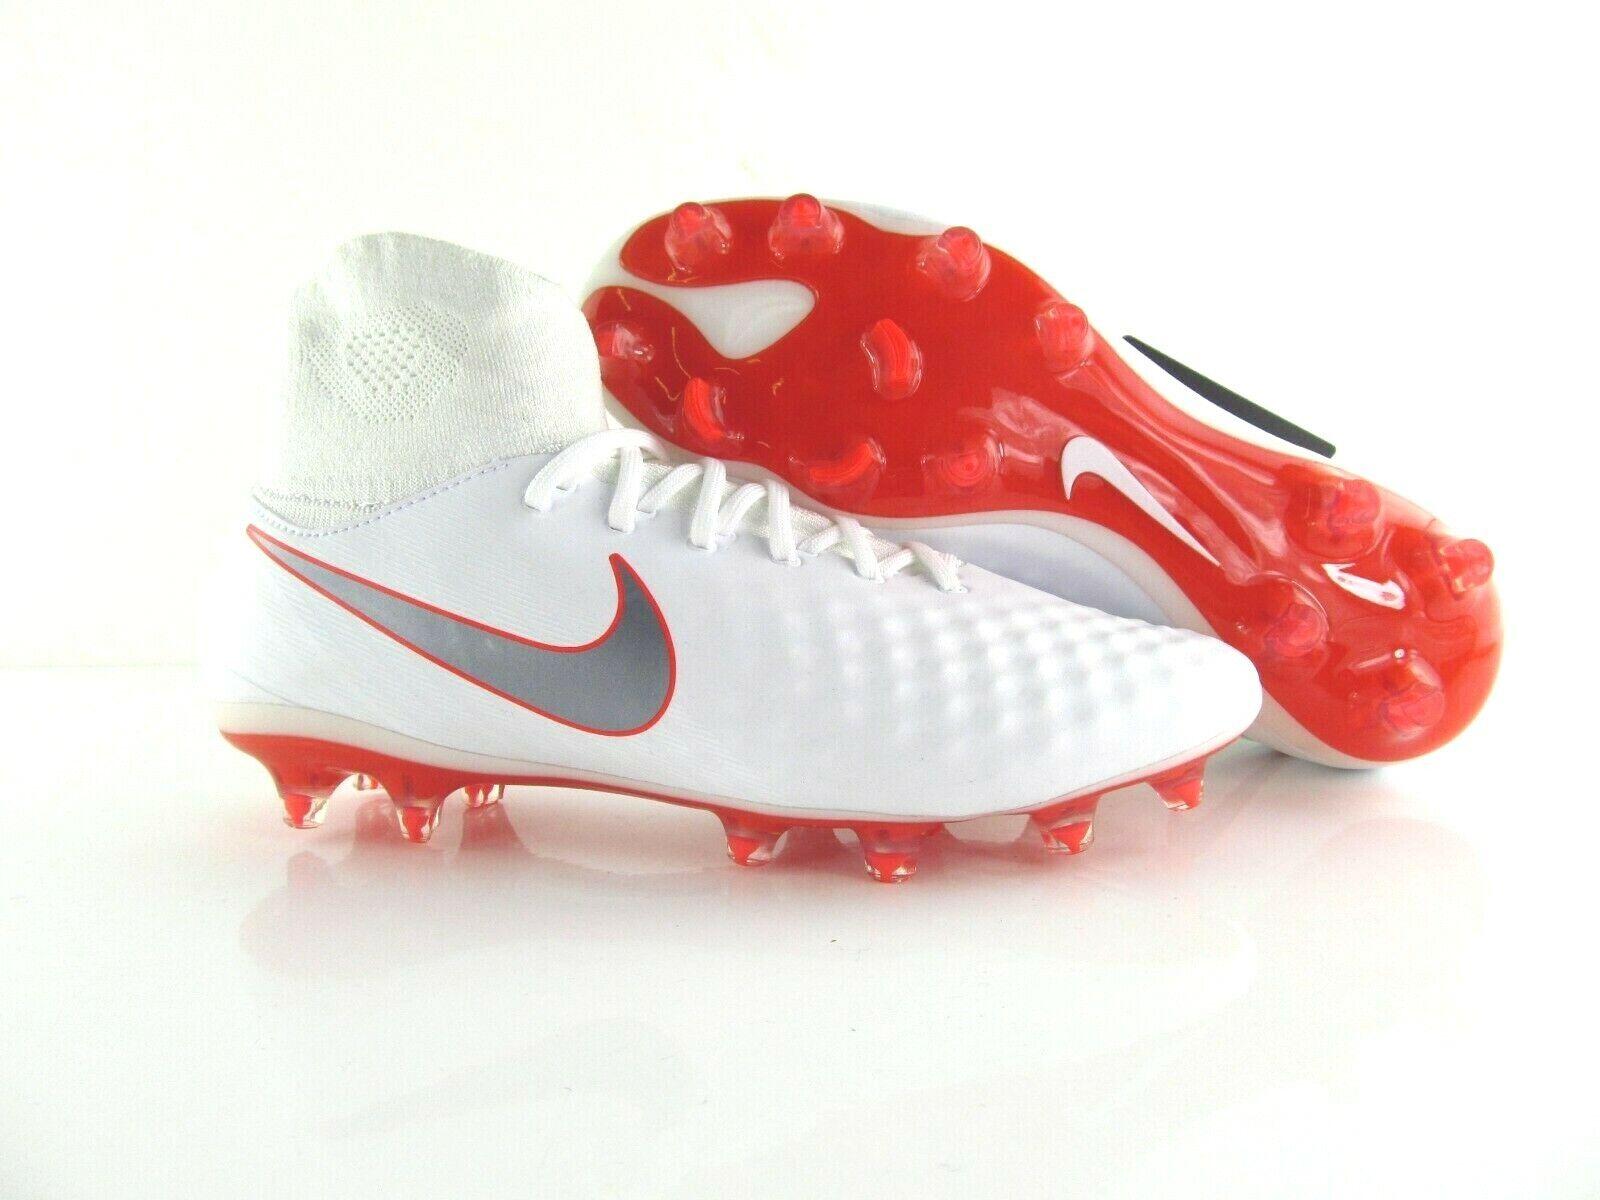 Nike magista obra 2 pro df FG acc Weiss rojo Soccer fútbol uk_7 us_8 41 EUR